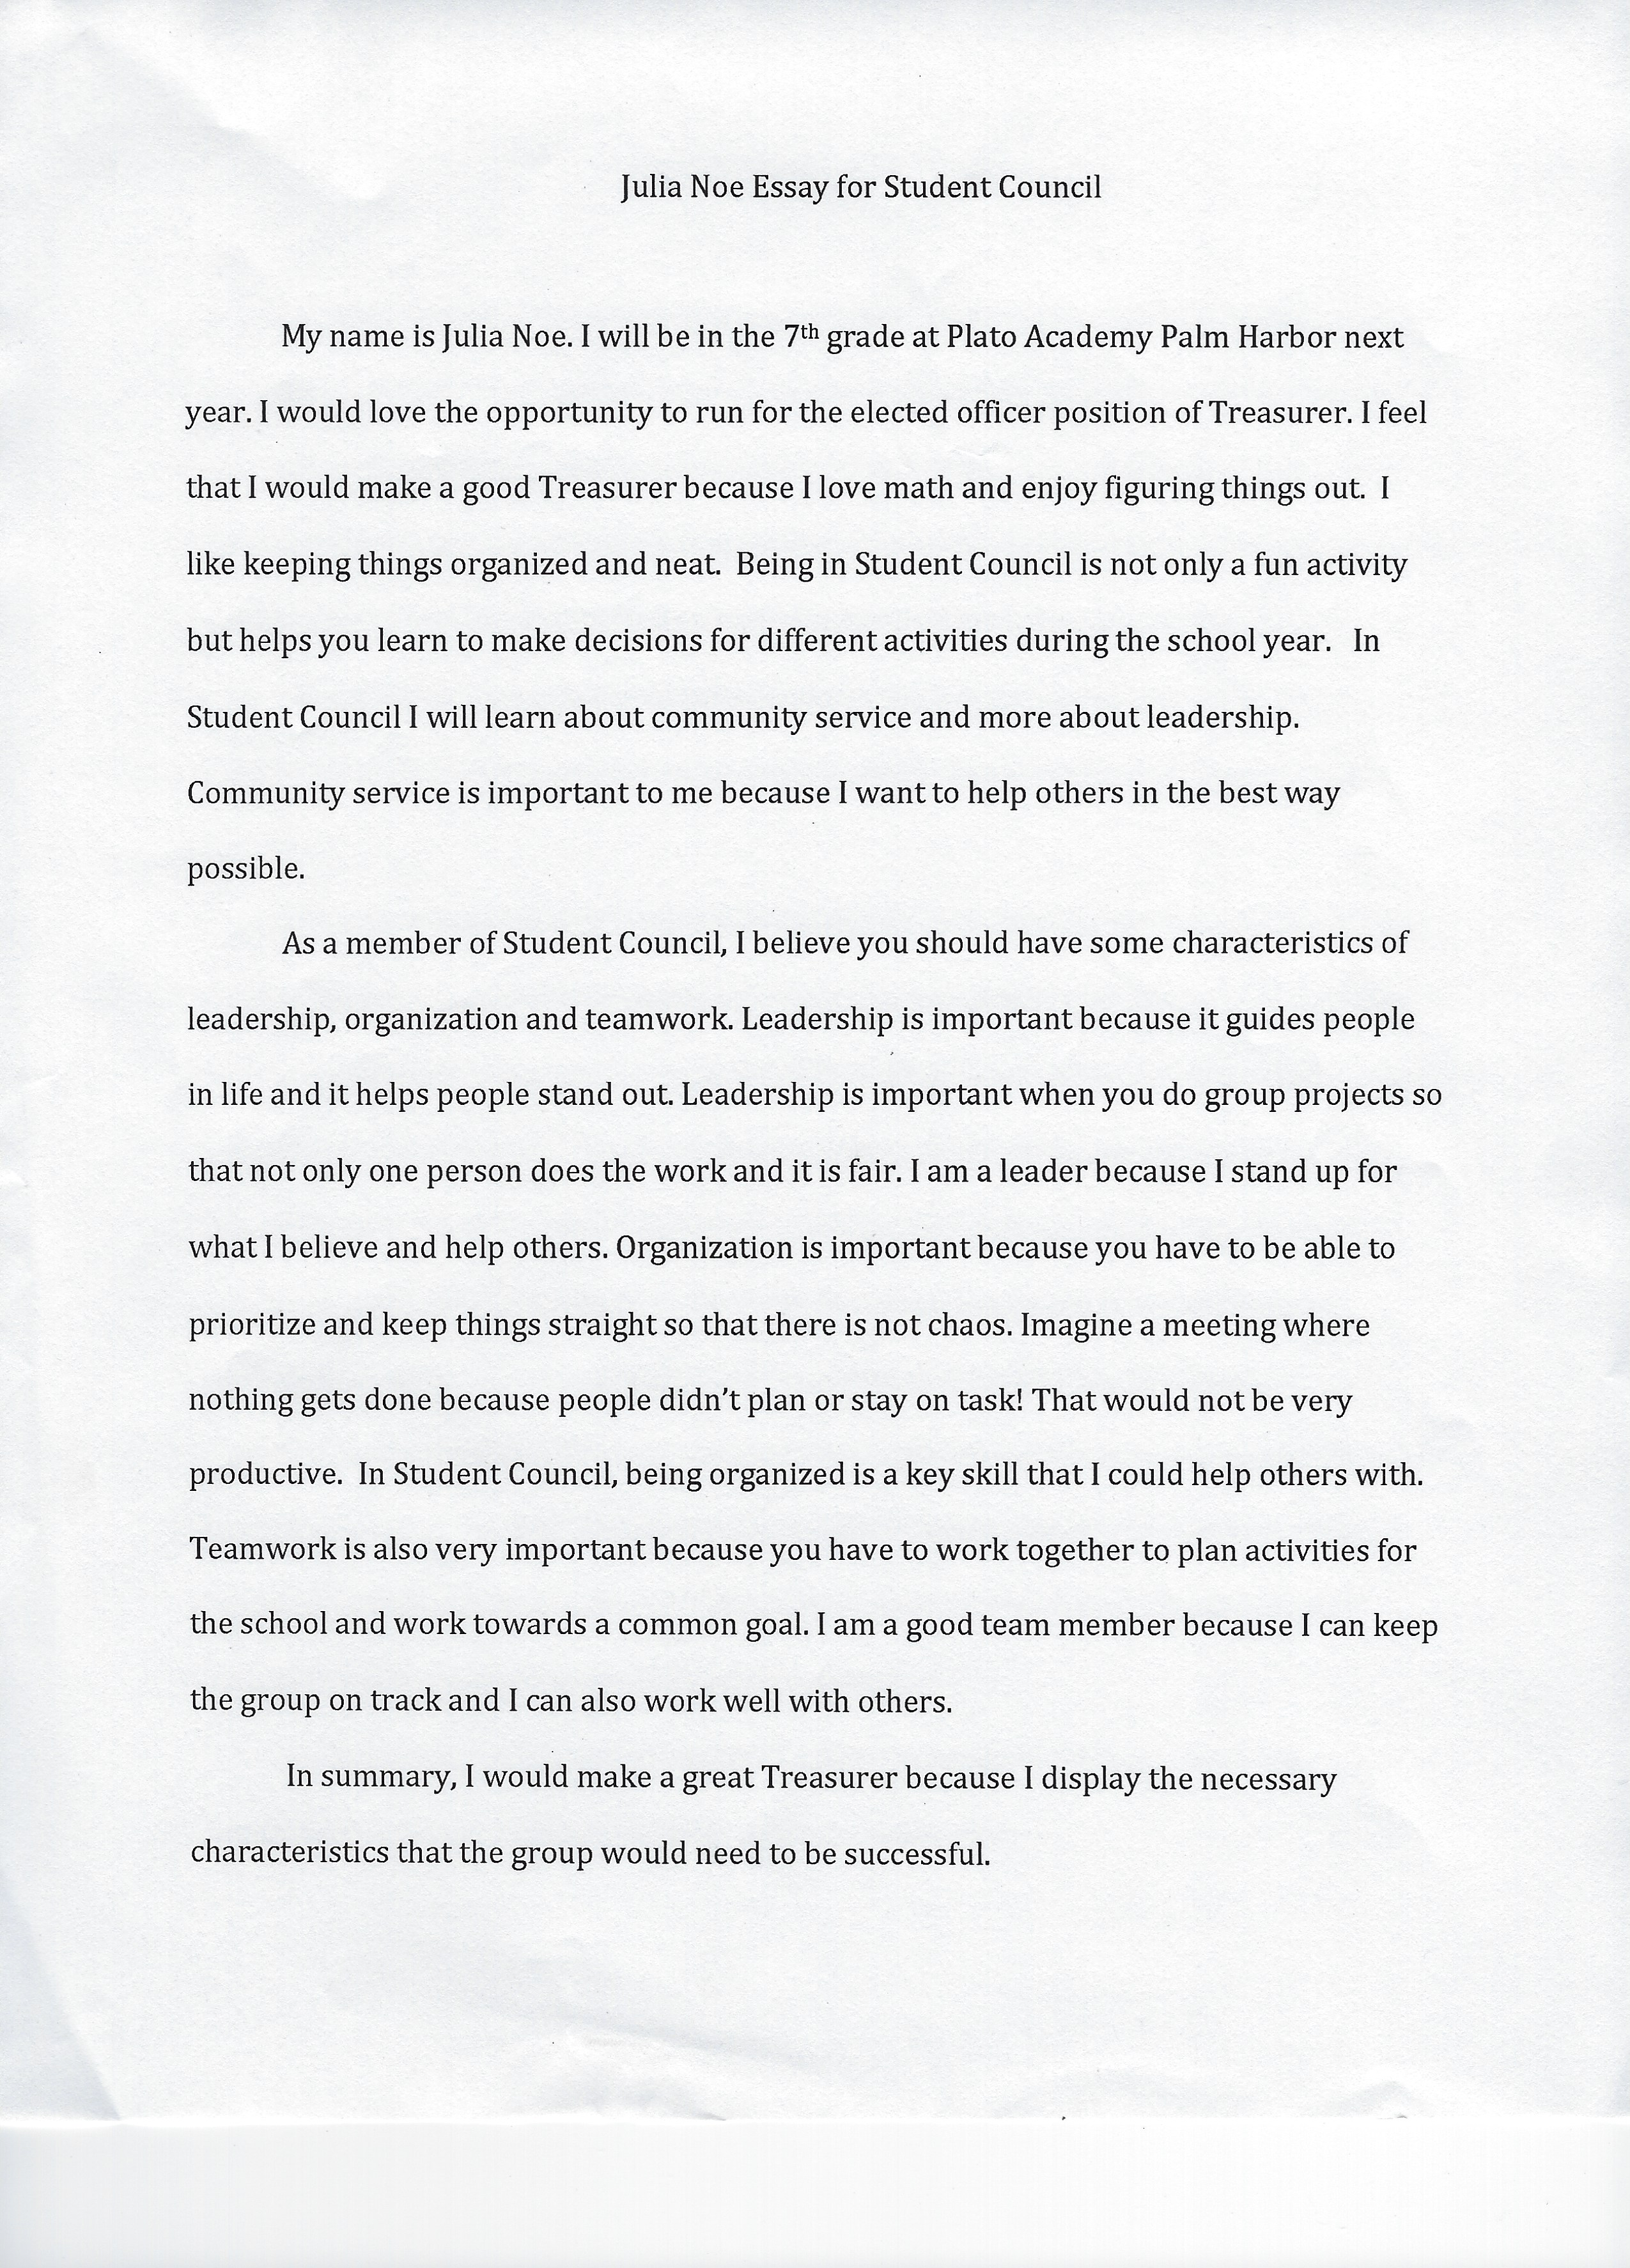 009 Student Council Essay Example Treasurer Noe Phenomenal Template For 5th Grade College Full